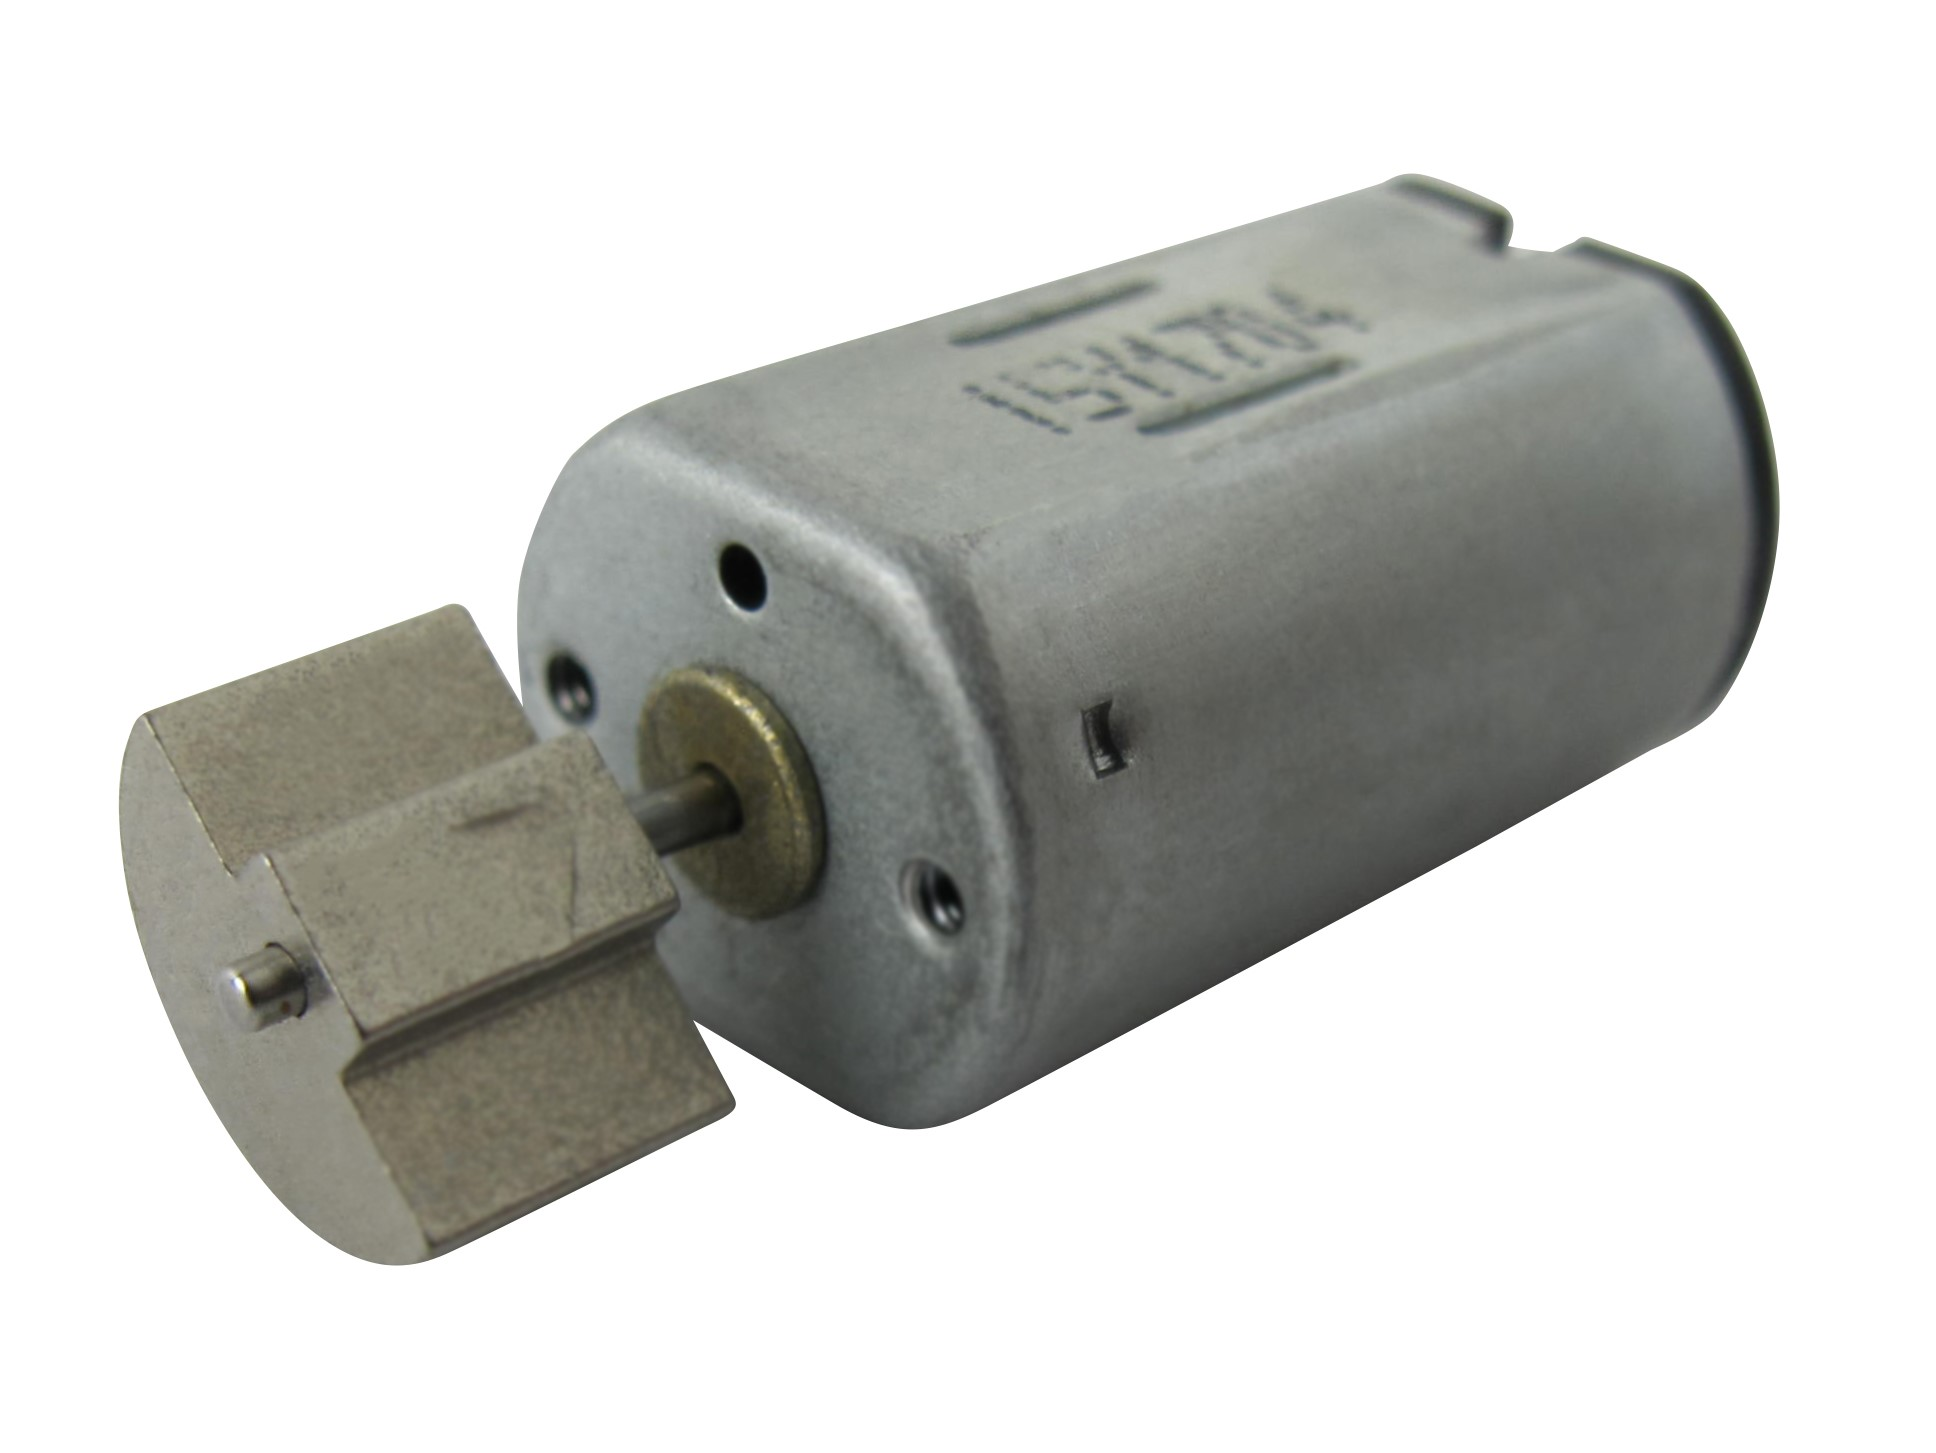 JP12-95J100A Cylindrical Vibrator Motor